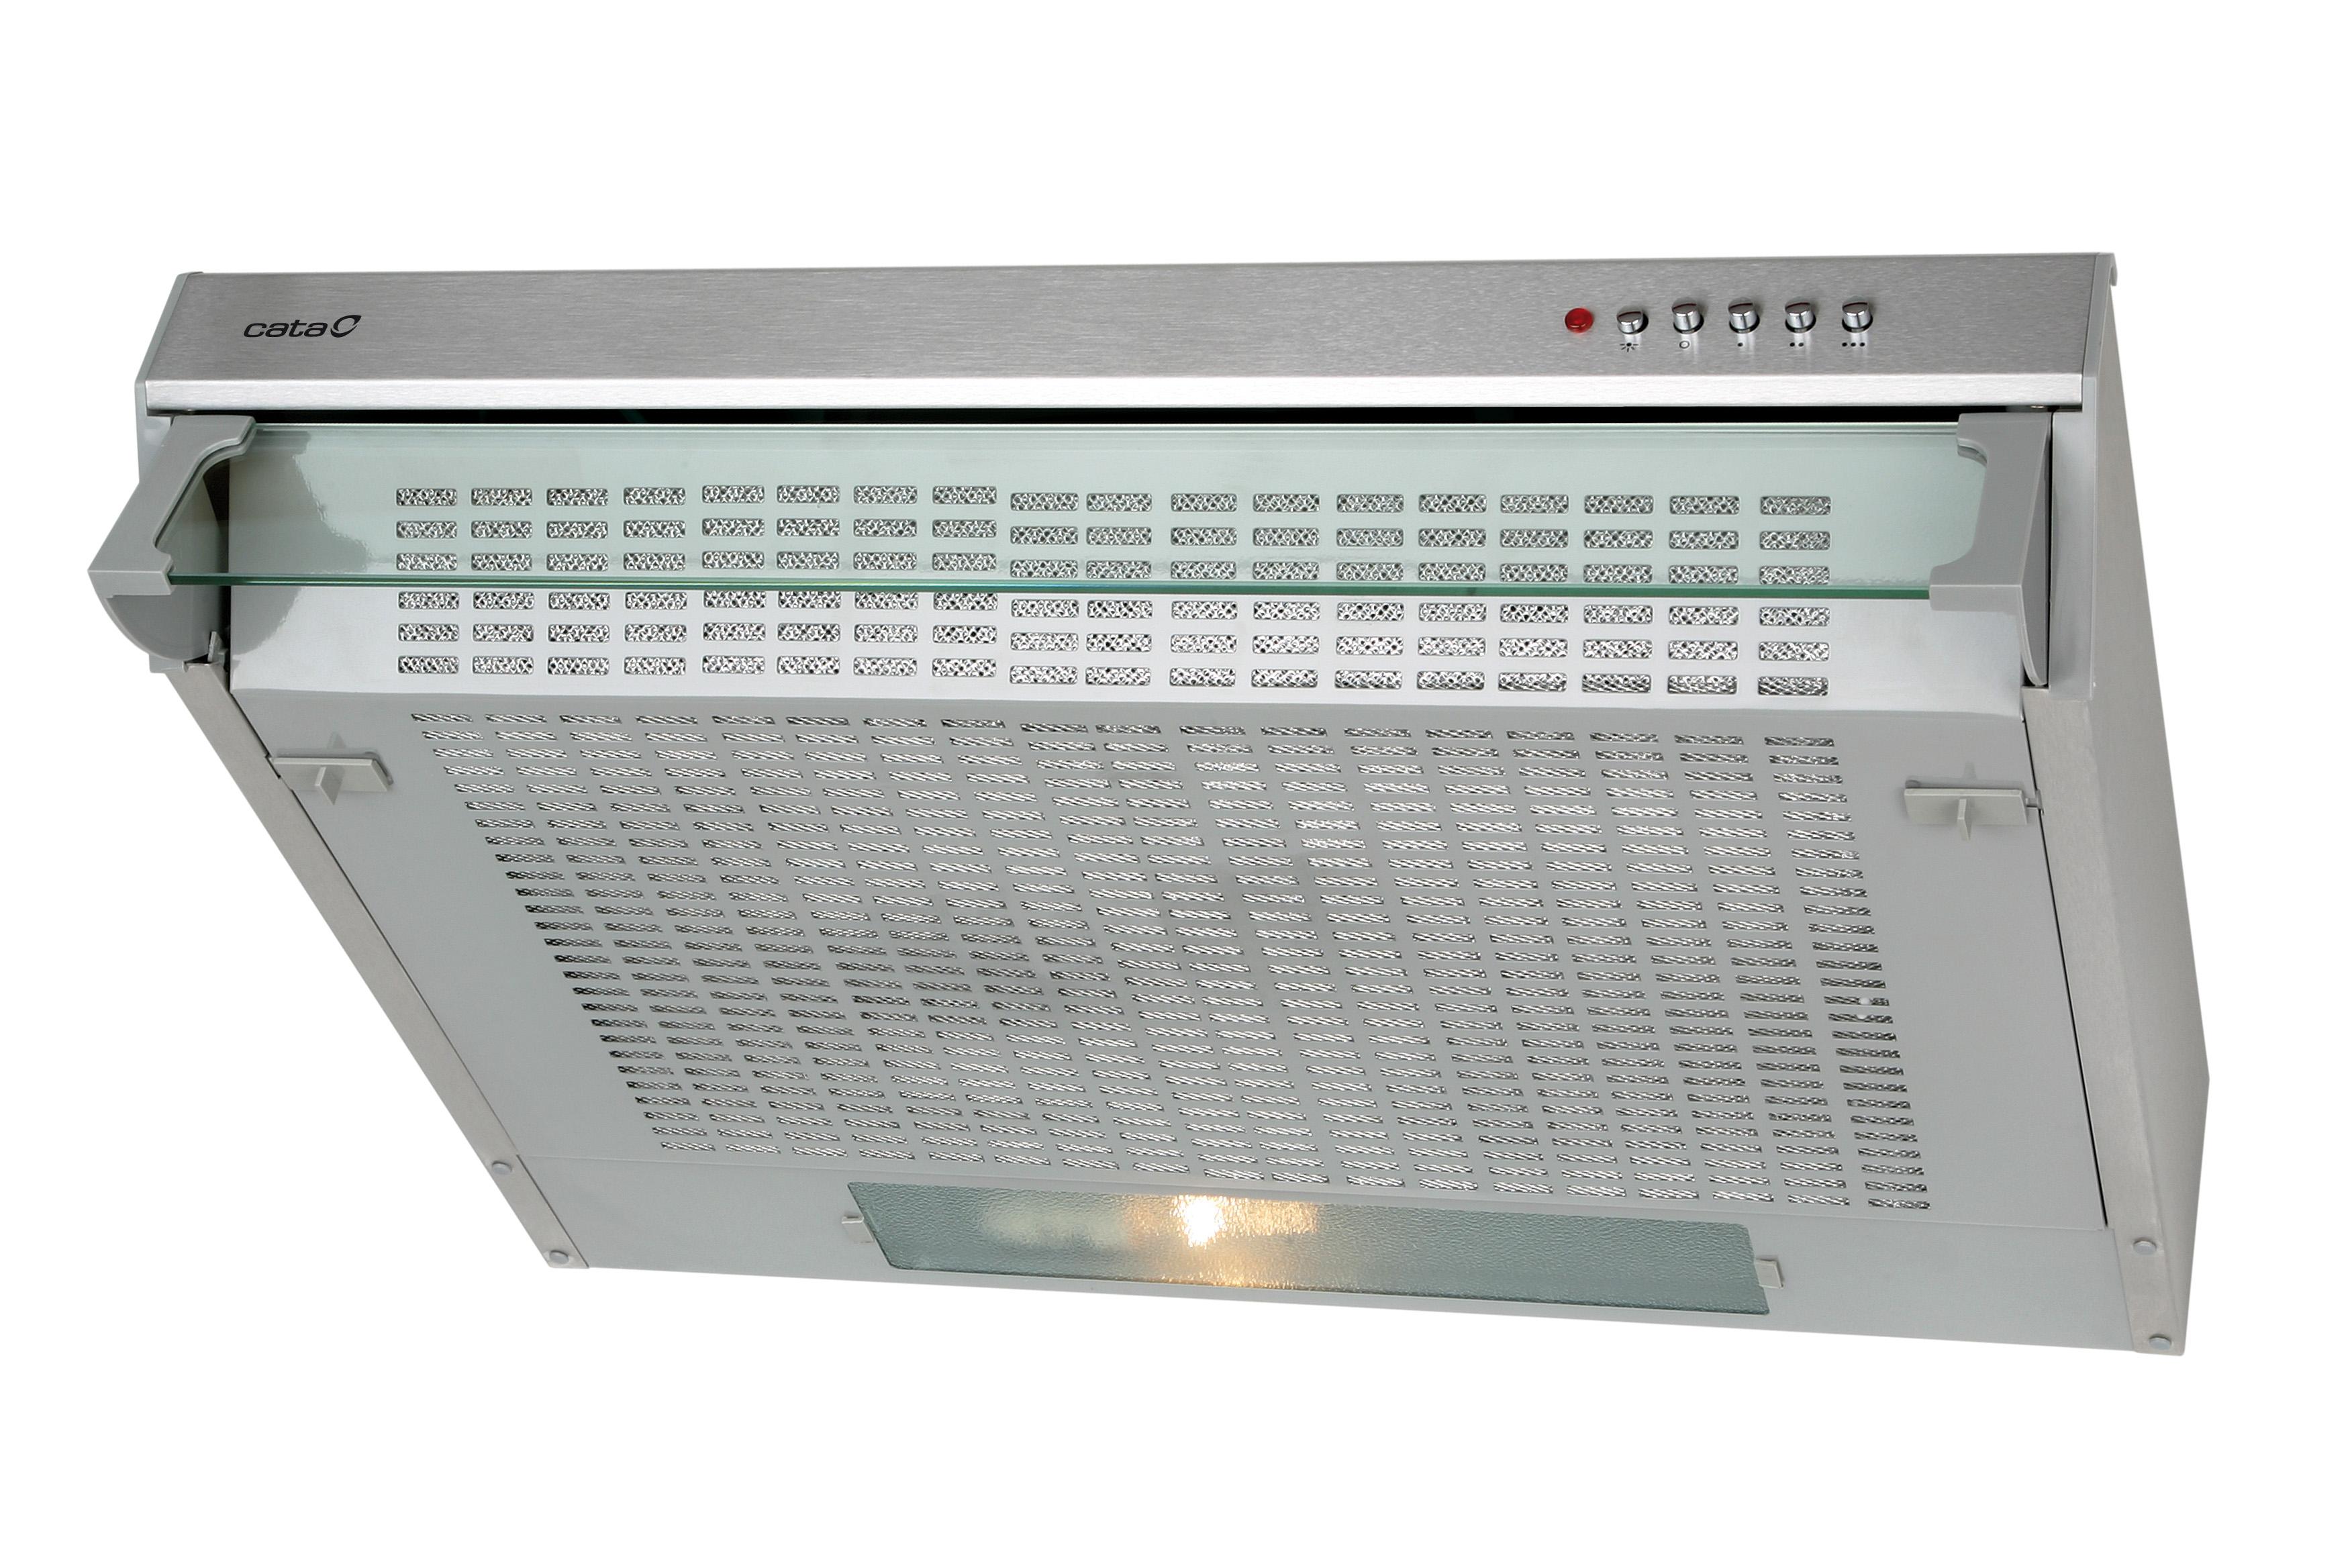 Вытяжка Cata F 2060 inox/b уровень stabila тип 80аm 200 см 16070